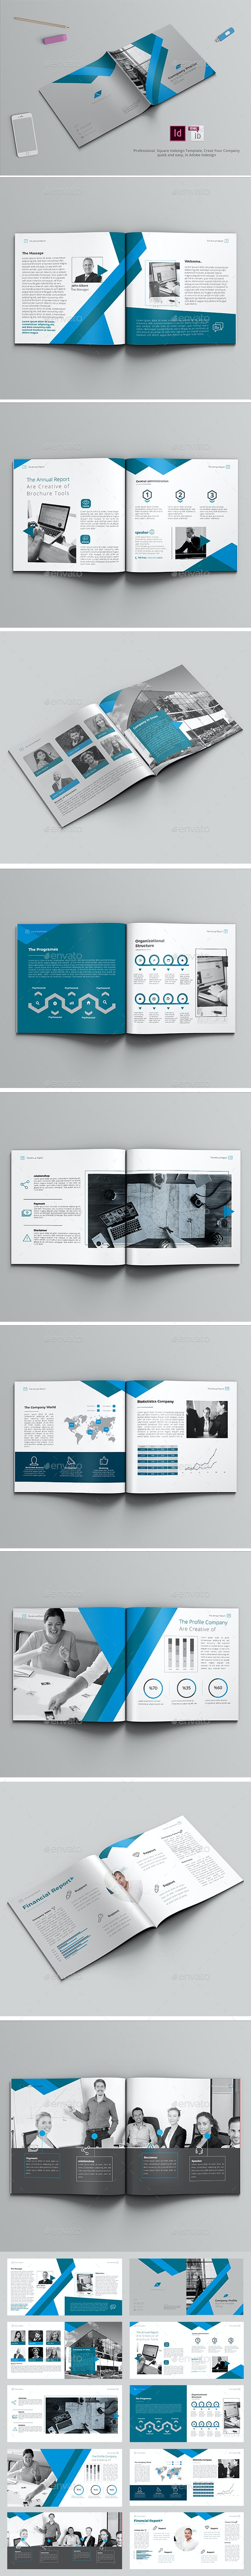 Square Blue Brochure Company - Brochures Print Templates